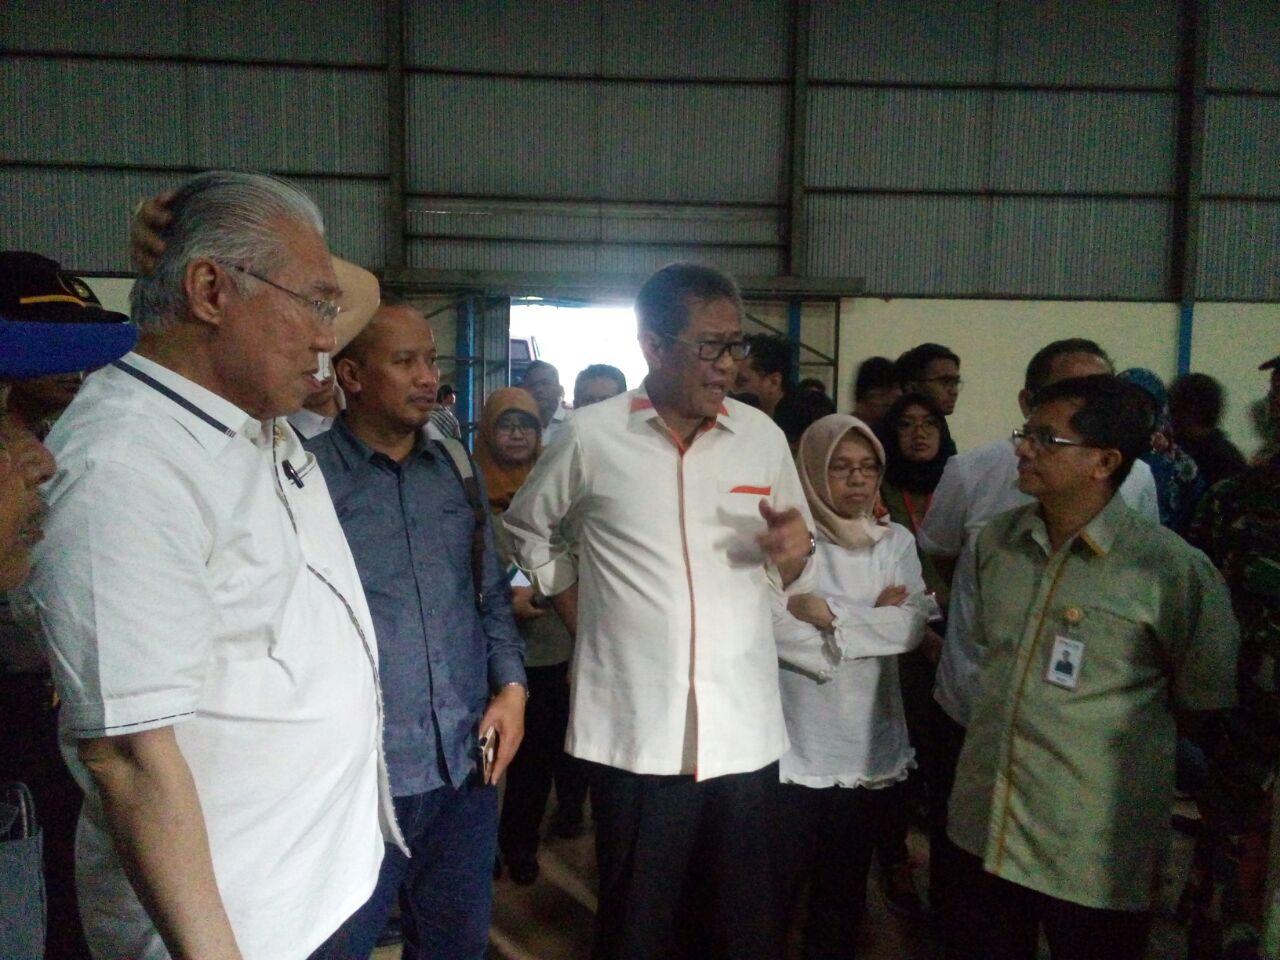 https: img-z.okeinfo.net content 2018 02 28 320 1865903 gudang-beras-bulog-di-indramayu-kosong-apa-benar-indonesia-surplus-beras-WMFDtFRpFT.jpeg